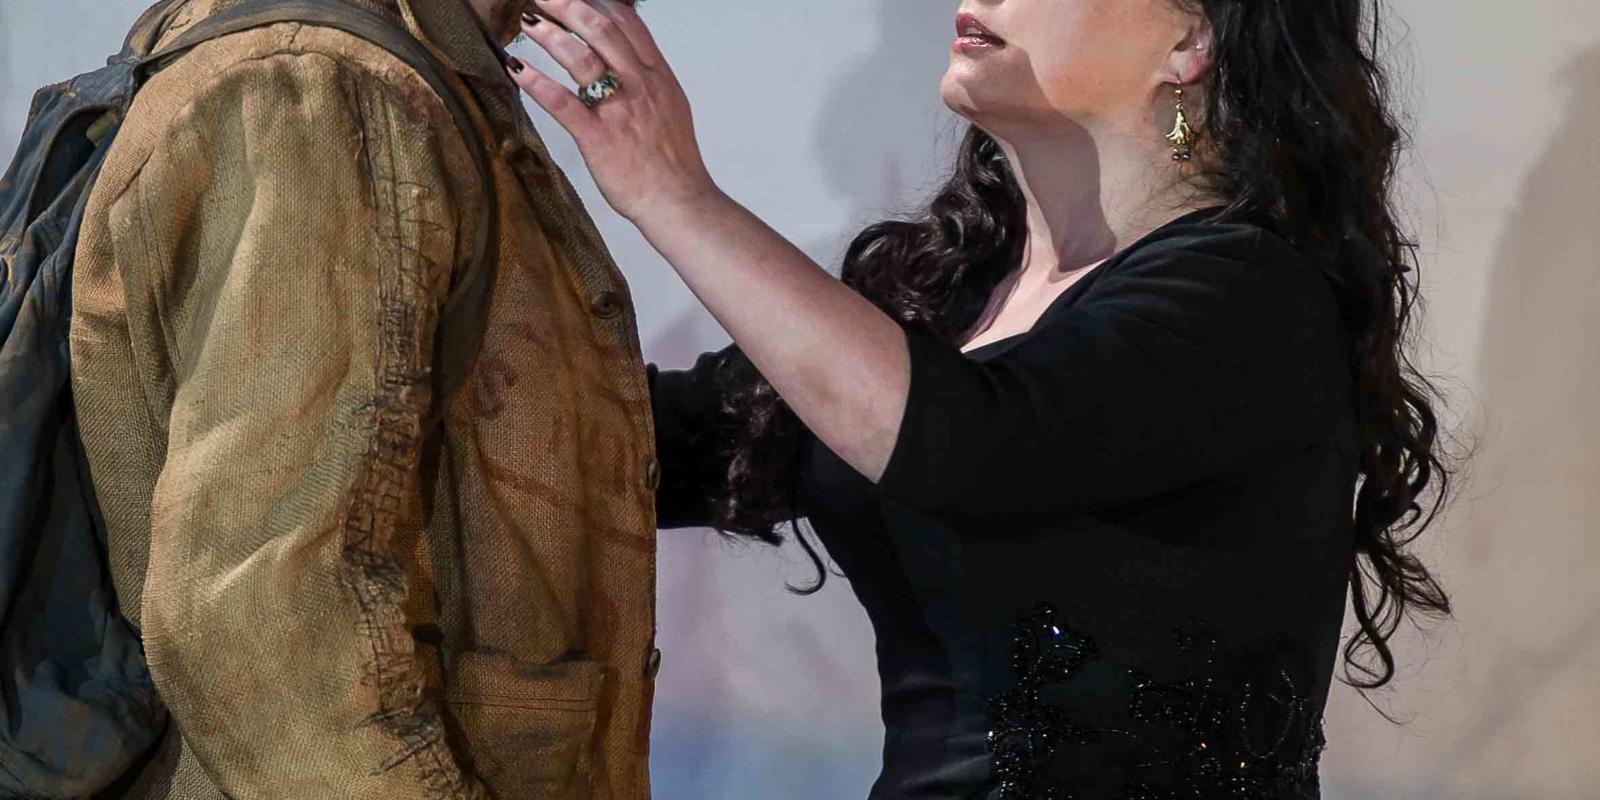 An image of Iestyn Davies and Rebecca Evans in Richard Jones's 2014 production of Rodelinda